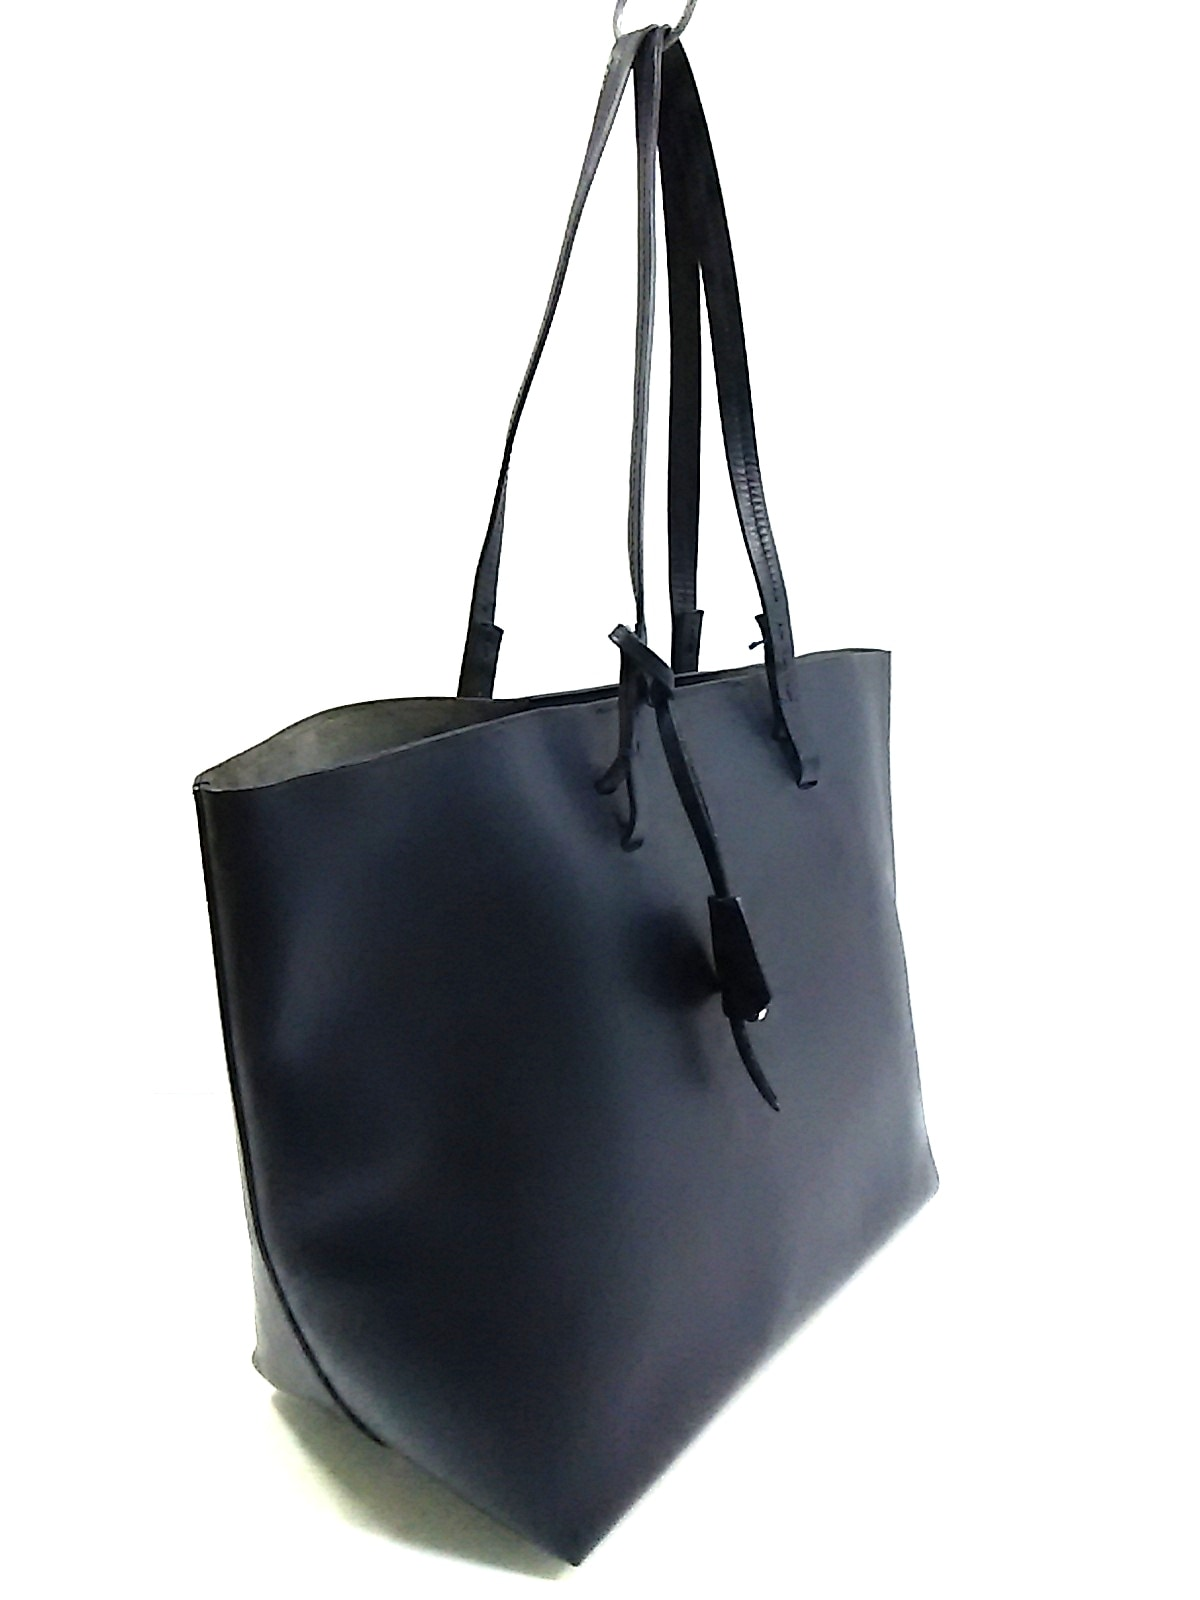 L&CBOLDRINI(ボルディーニ)のトートバッグ